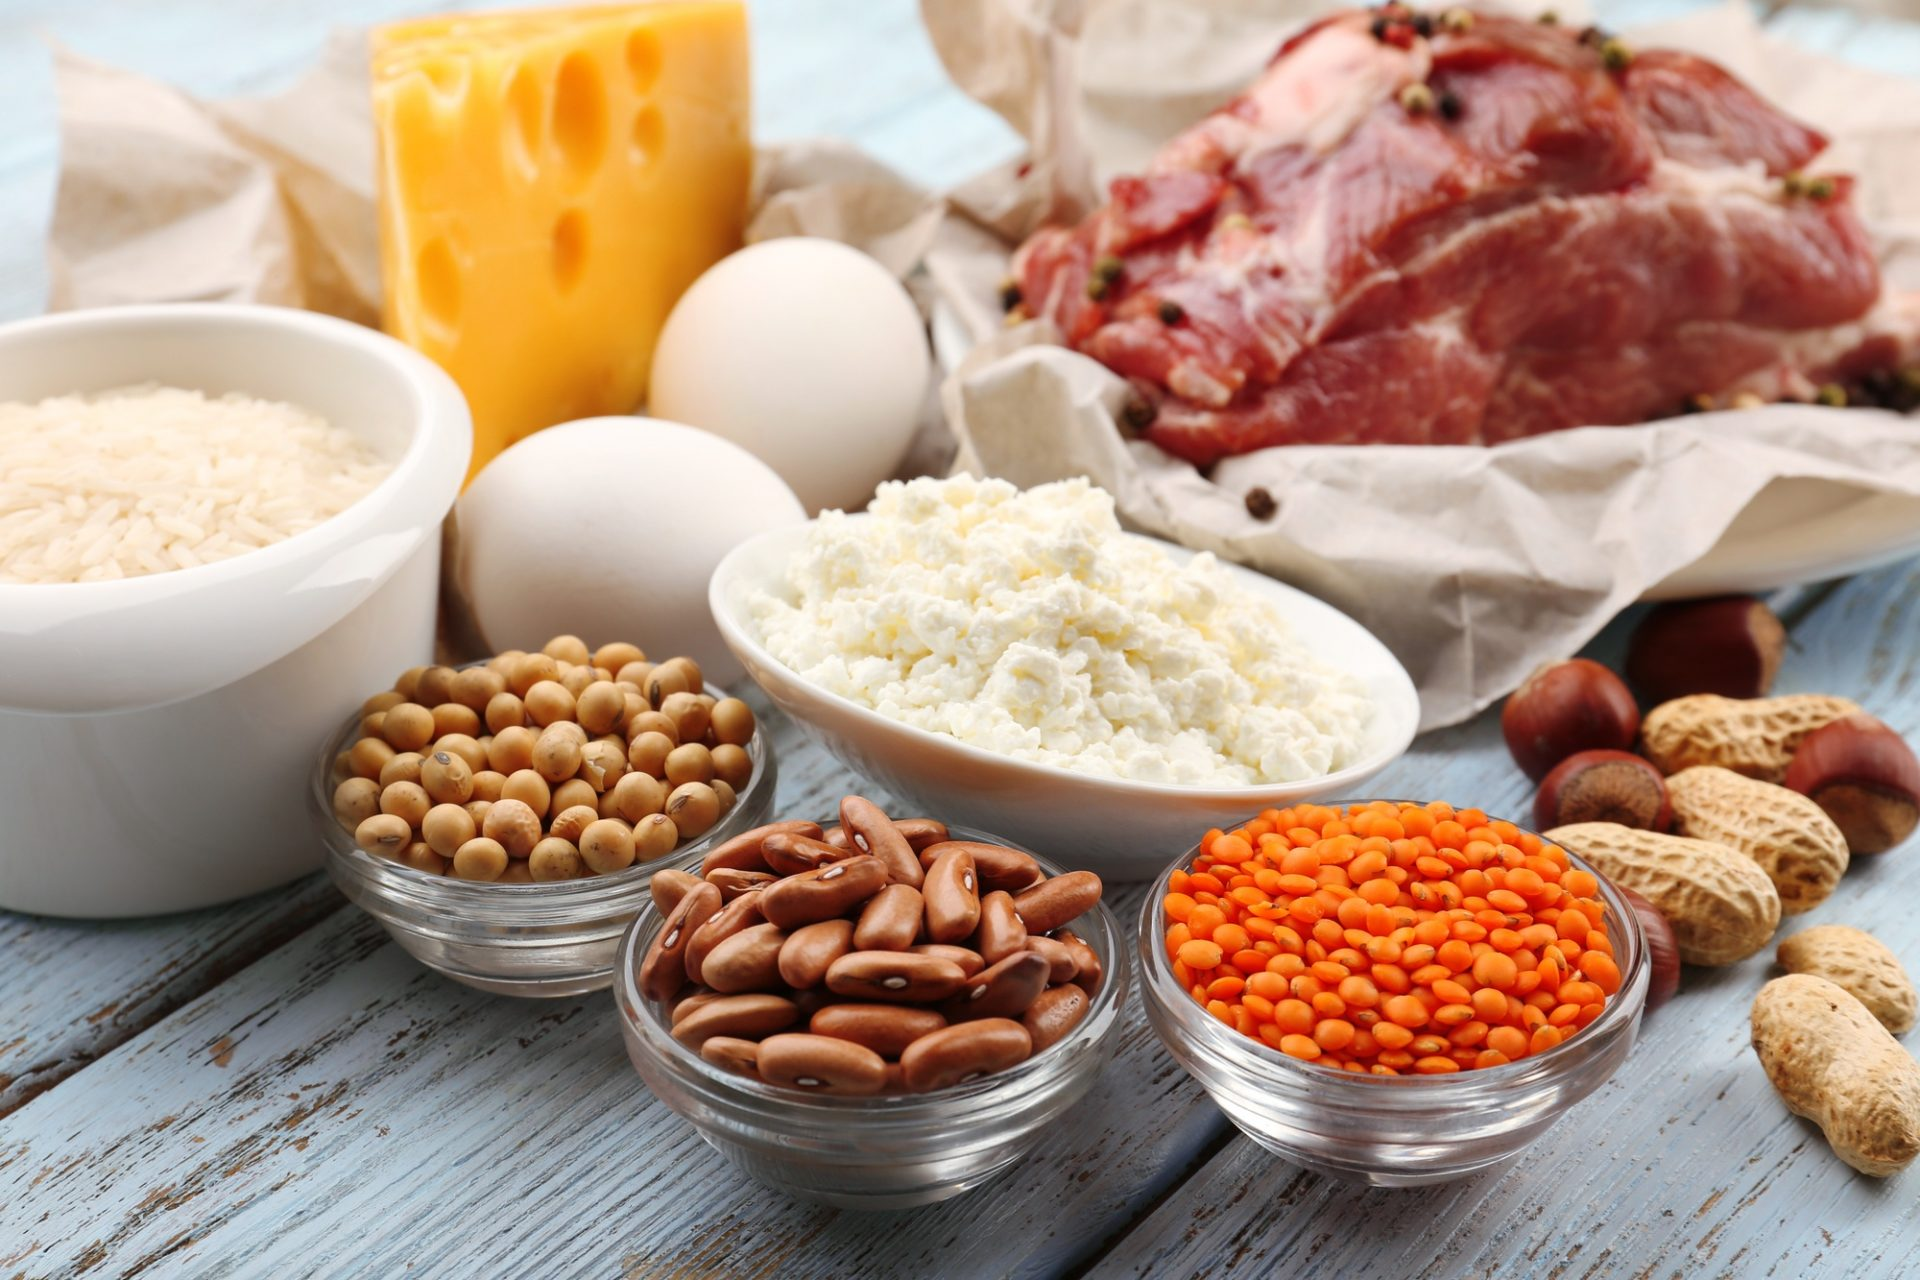 Aminnu: O que é preciso saber sobre aminoácidos?